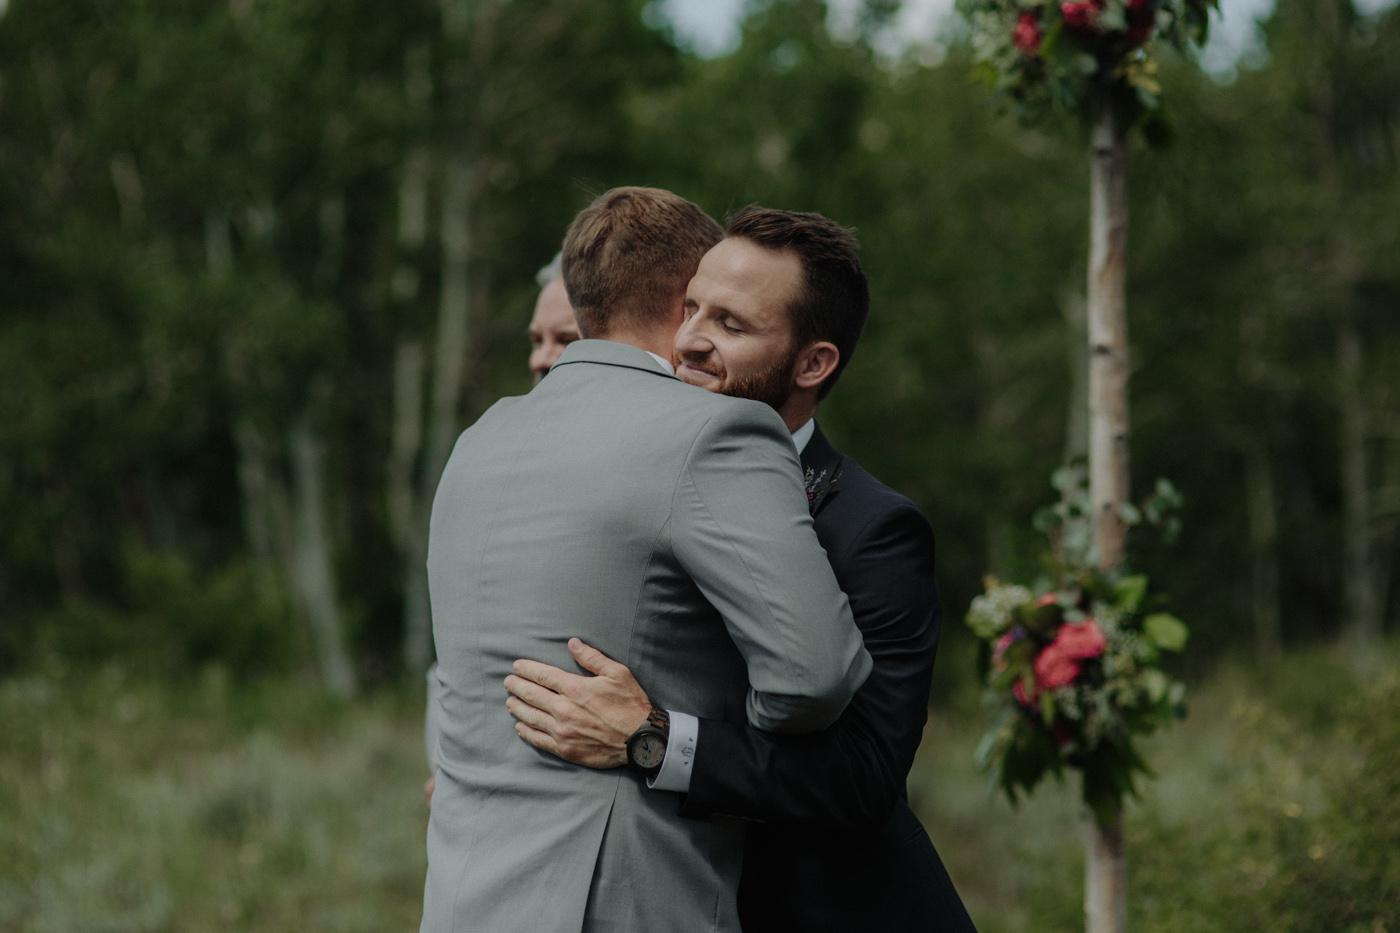 woods-walk-trail-crested-butte-colorado-wedding-29.jpg